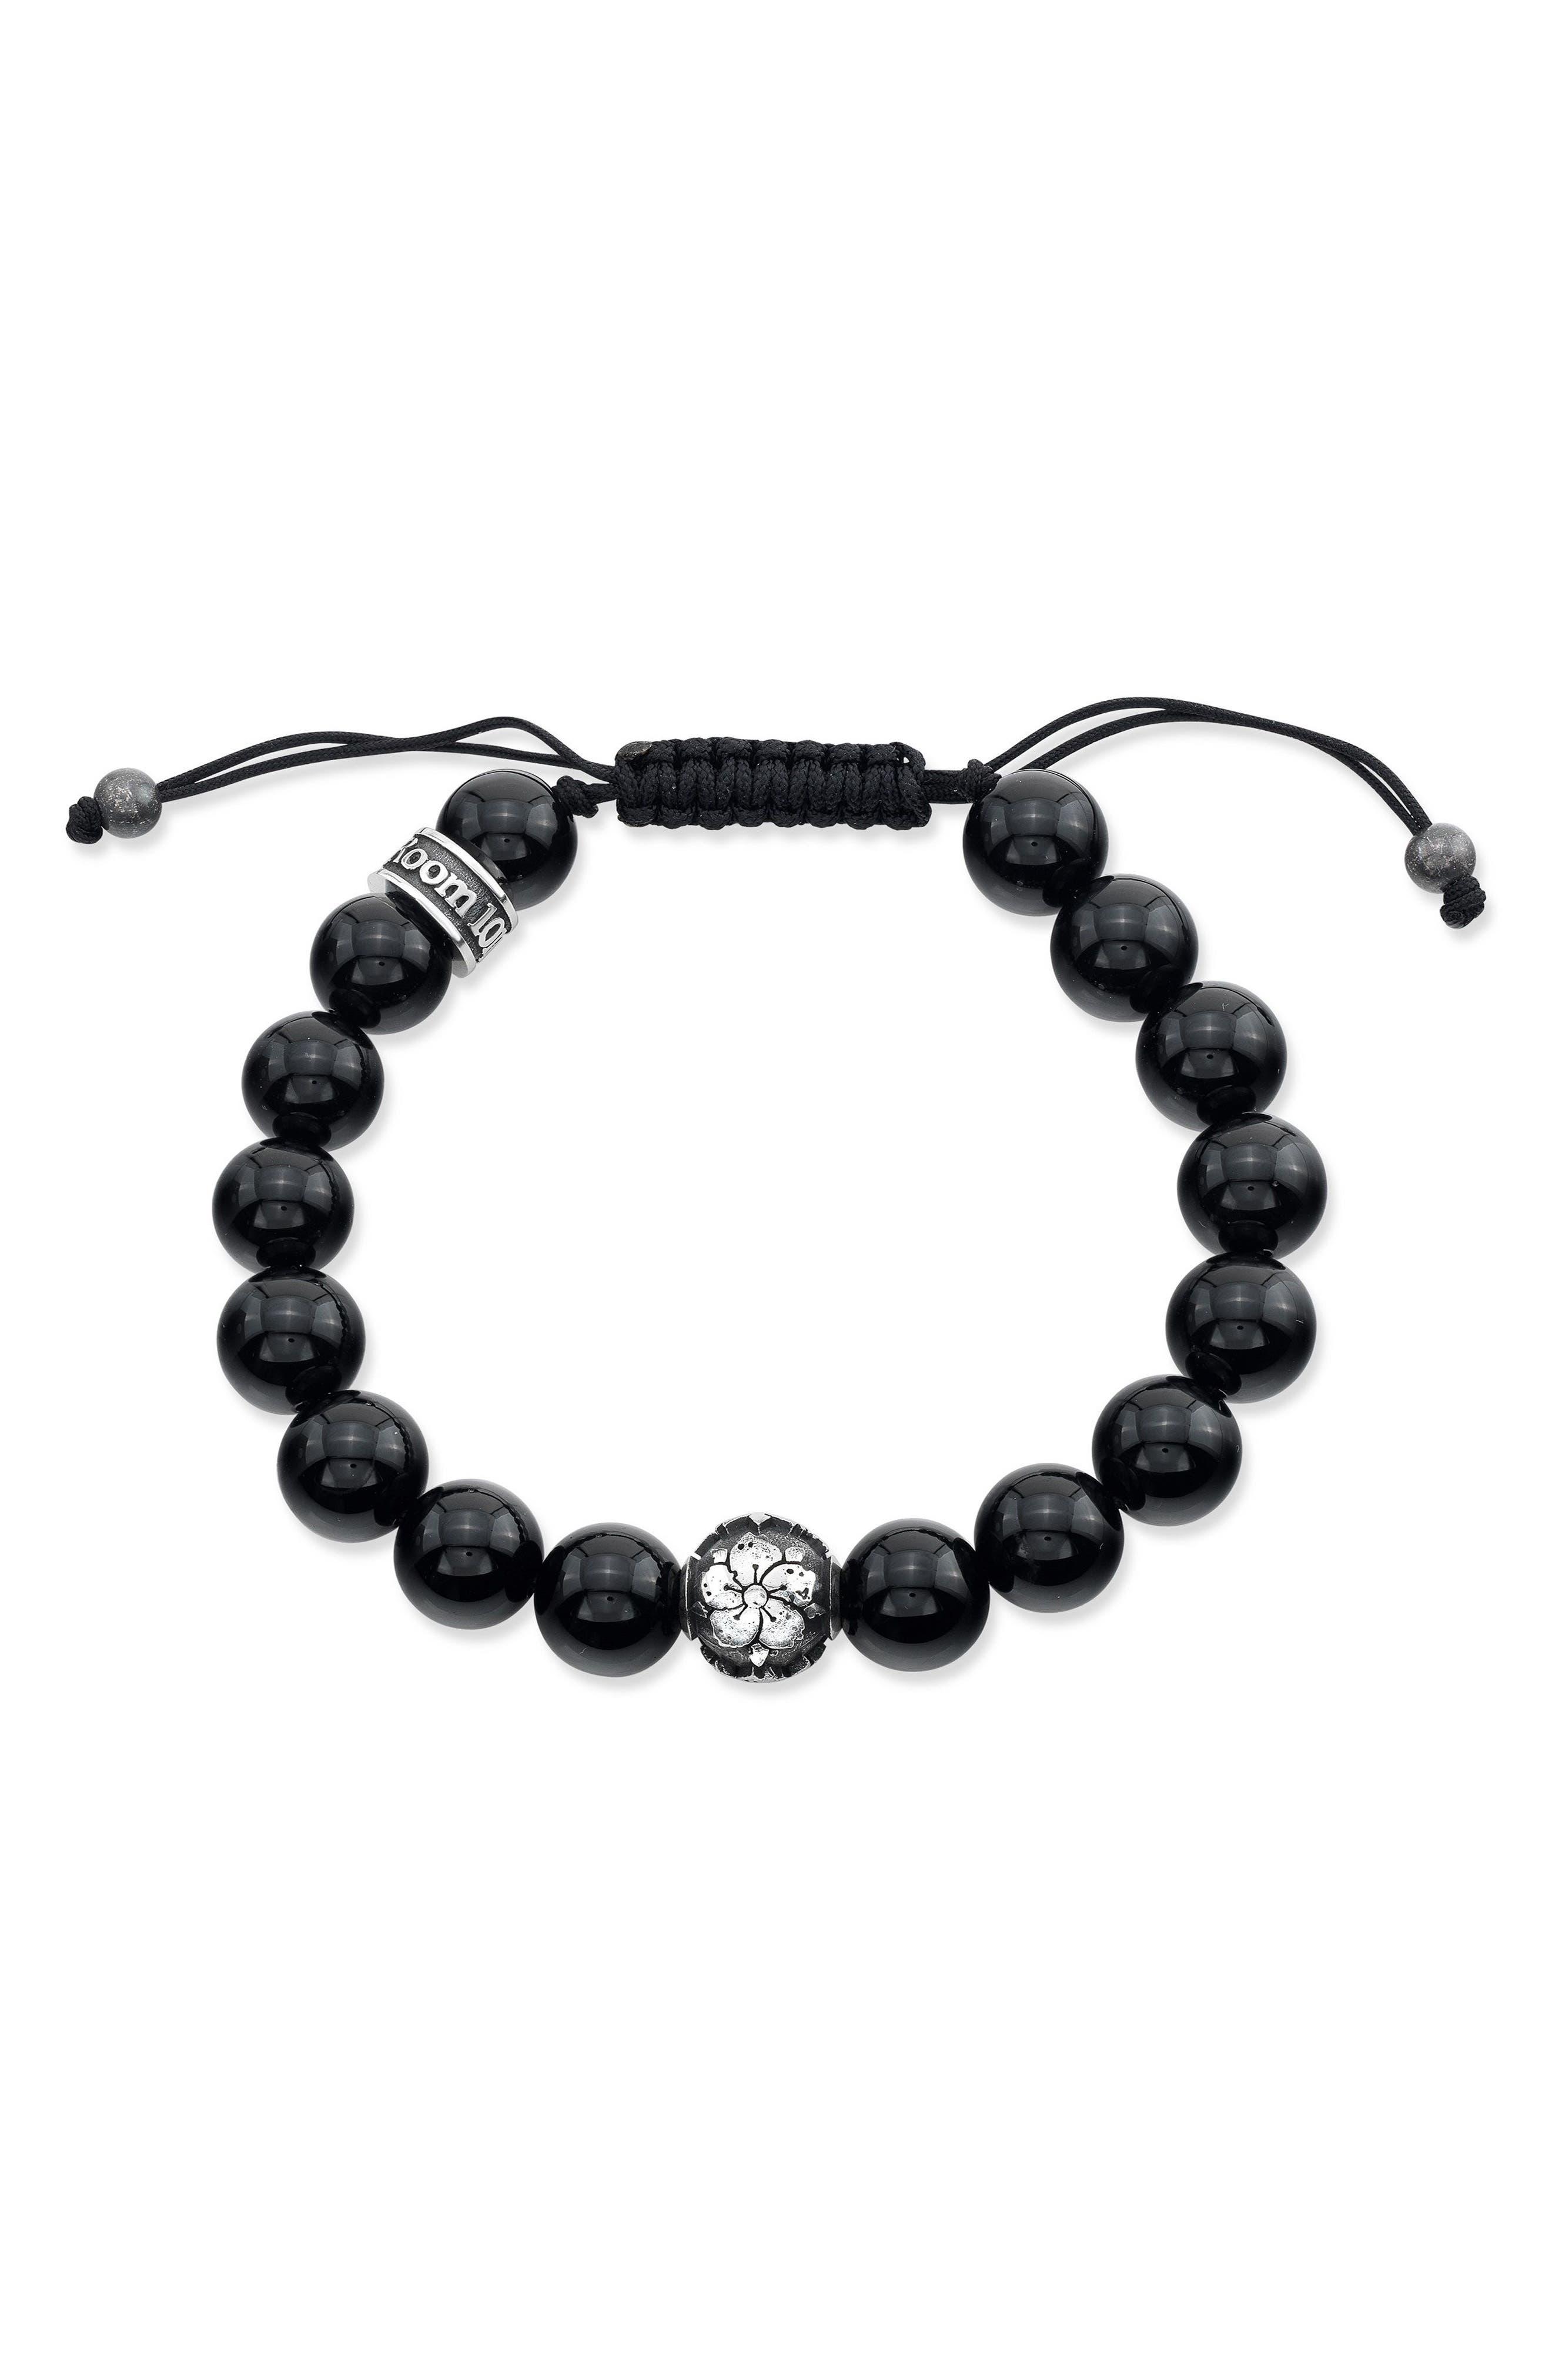 Alternate Image 1 Selected - Room101 Agate Bead Shamballa Bracelet